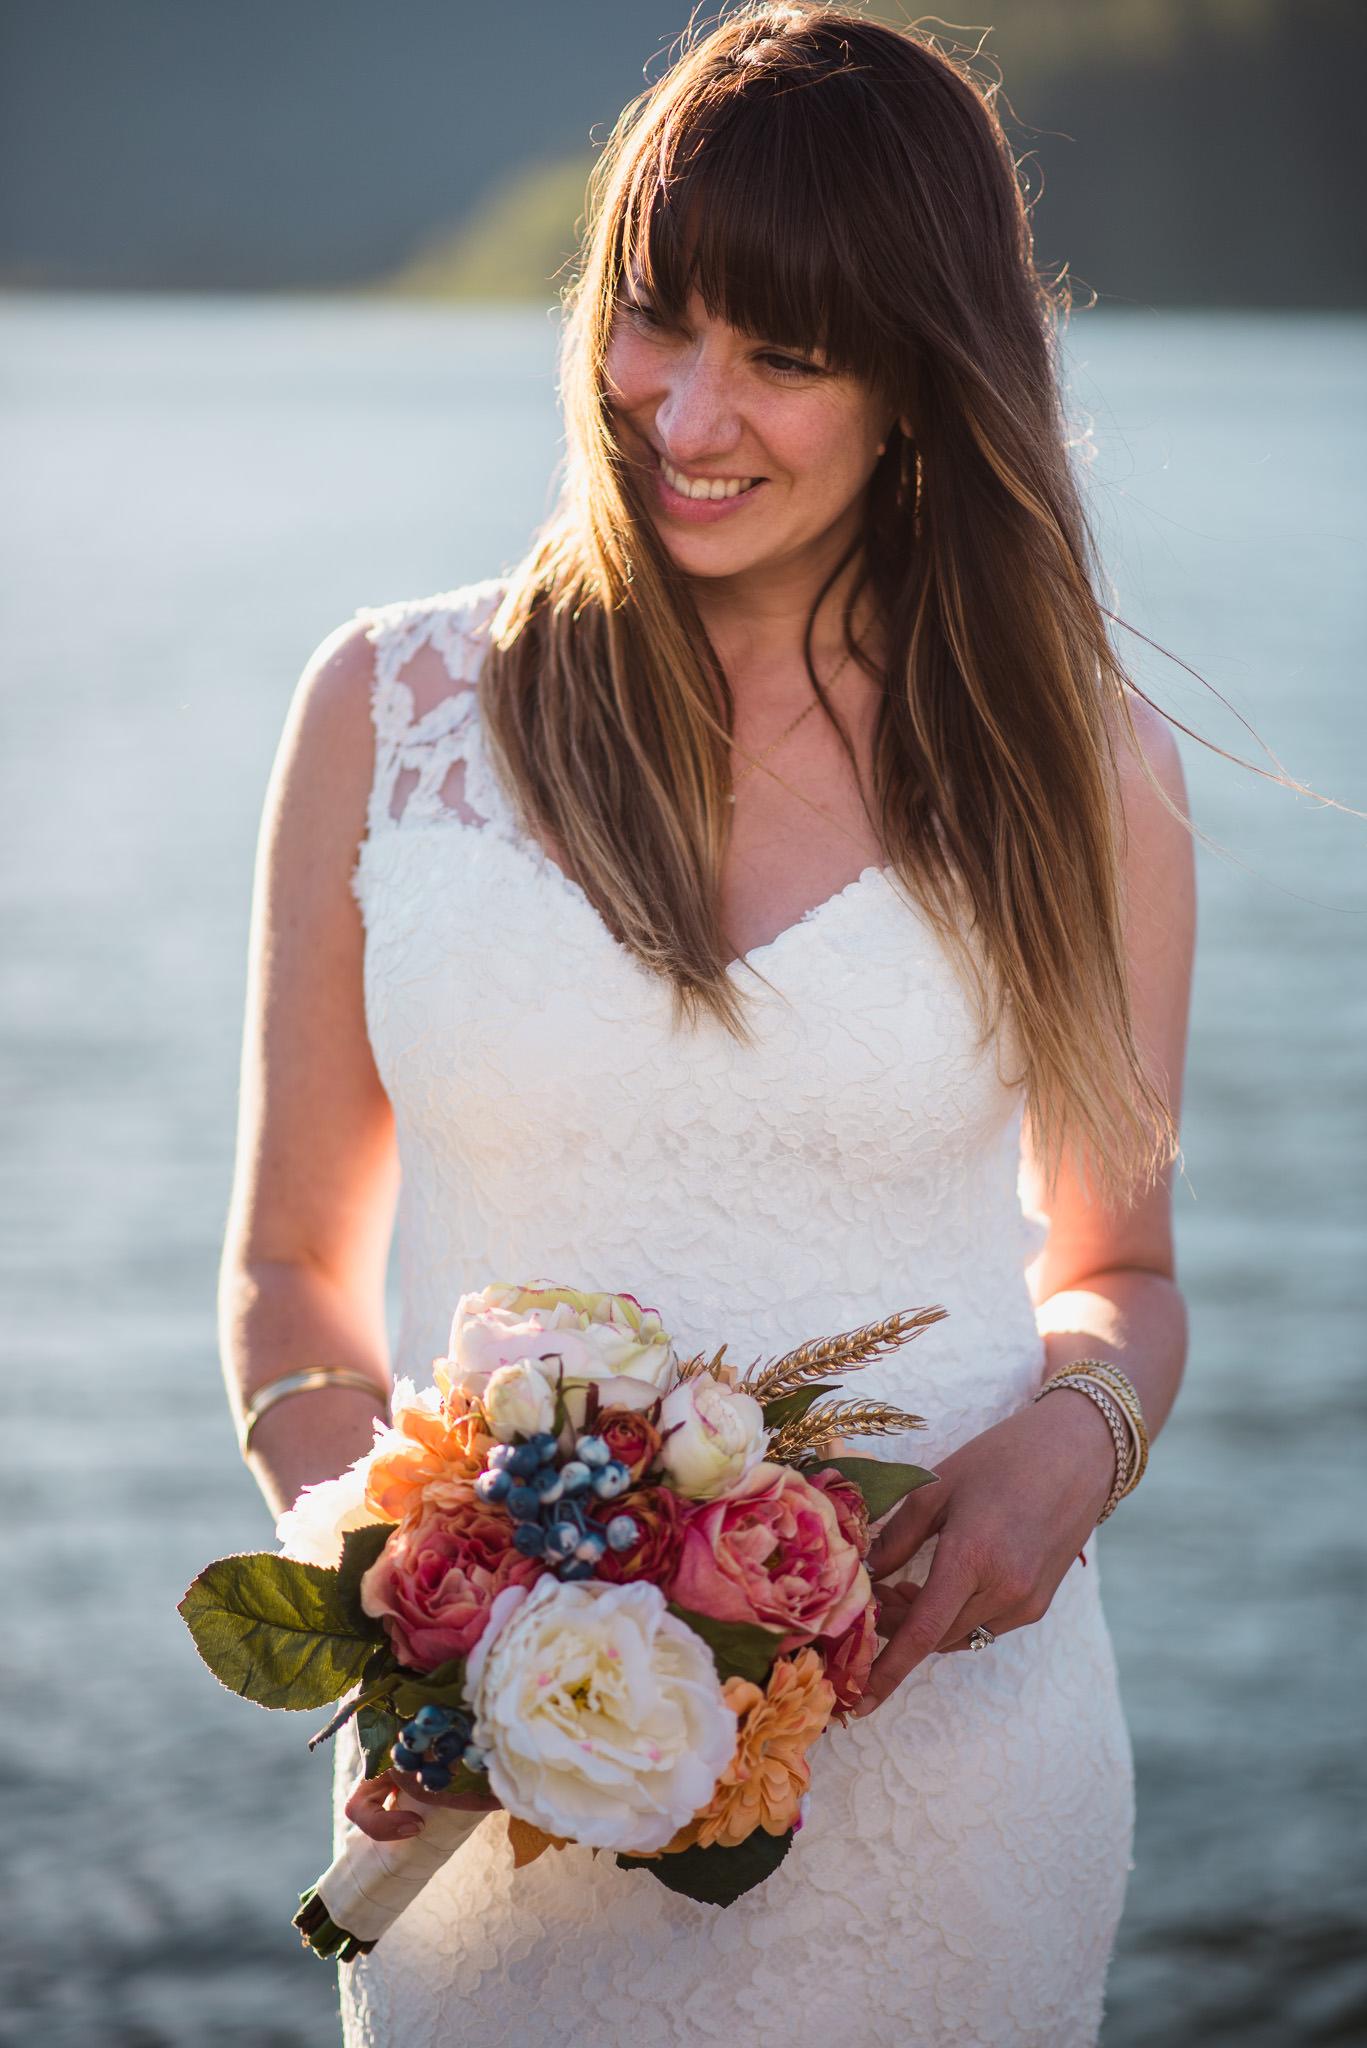 Melanie-Matt-Pitt-Lake-Post-Wedding-Shoot-Victoria-Wedding-Photographers-14.jpg